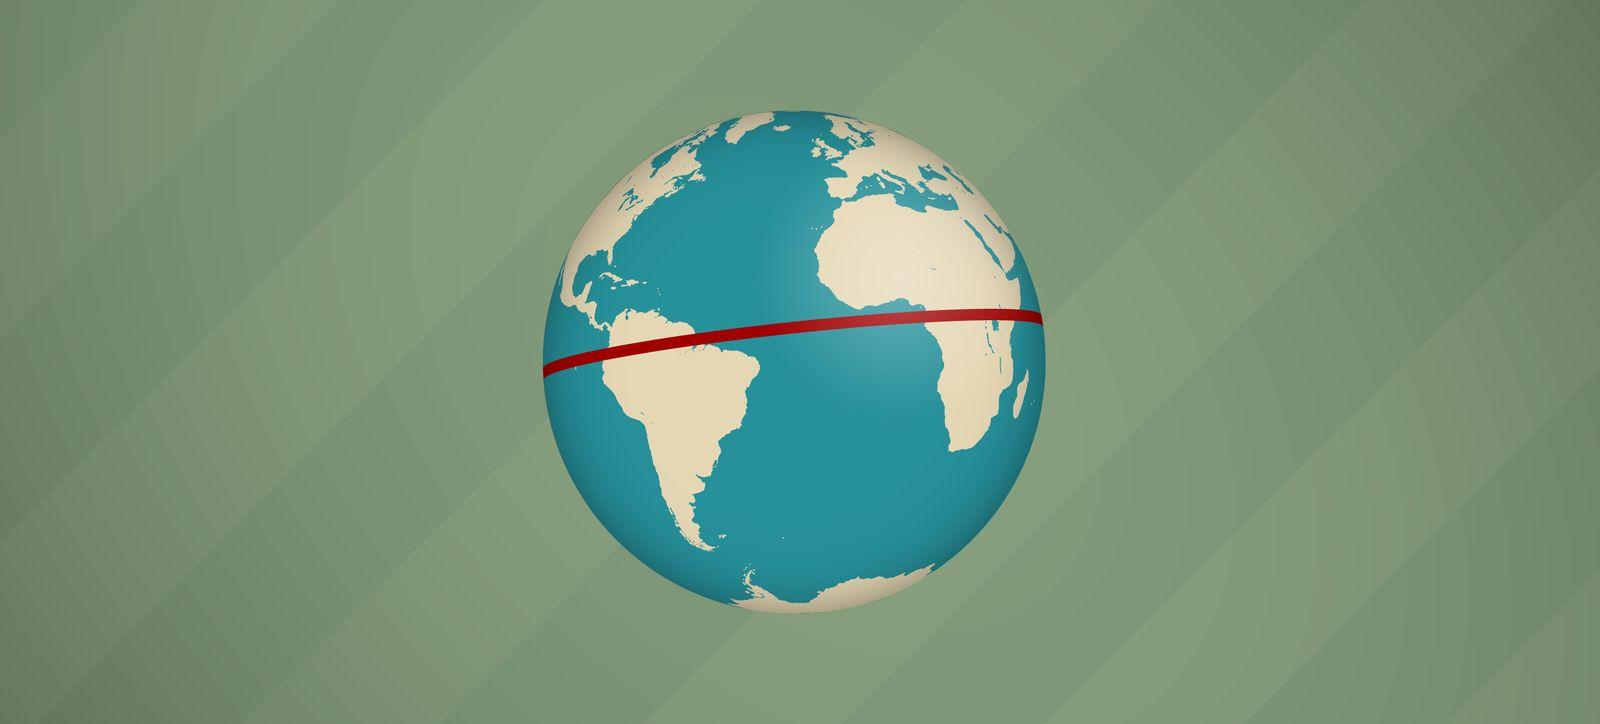 Rätsel der Woche Erde Band v2